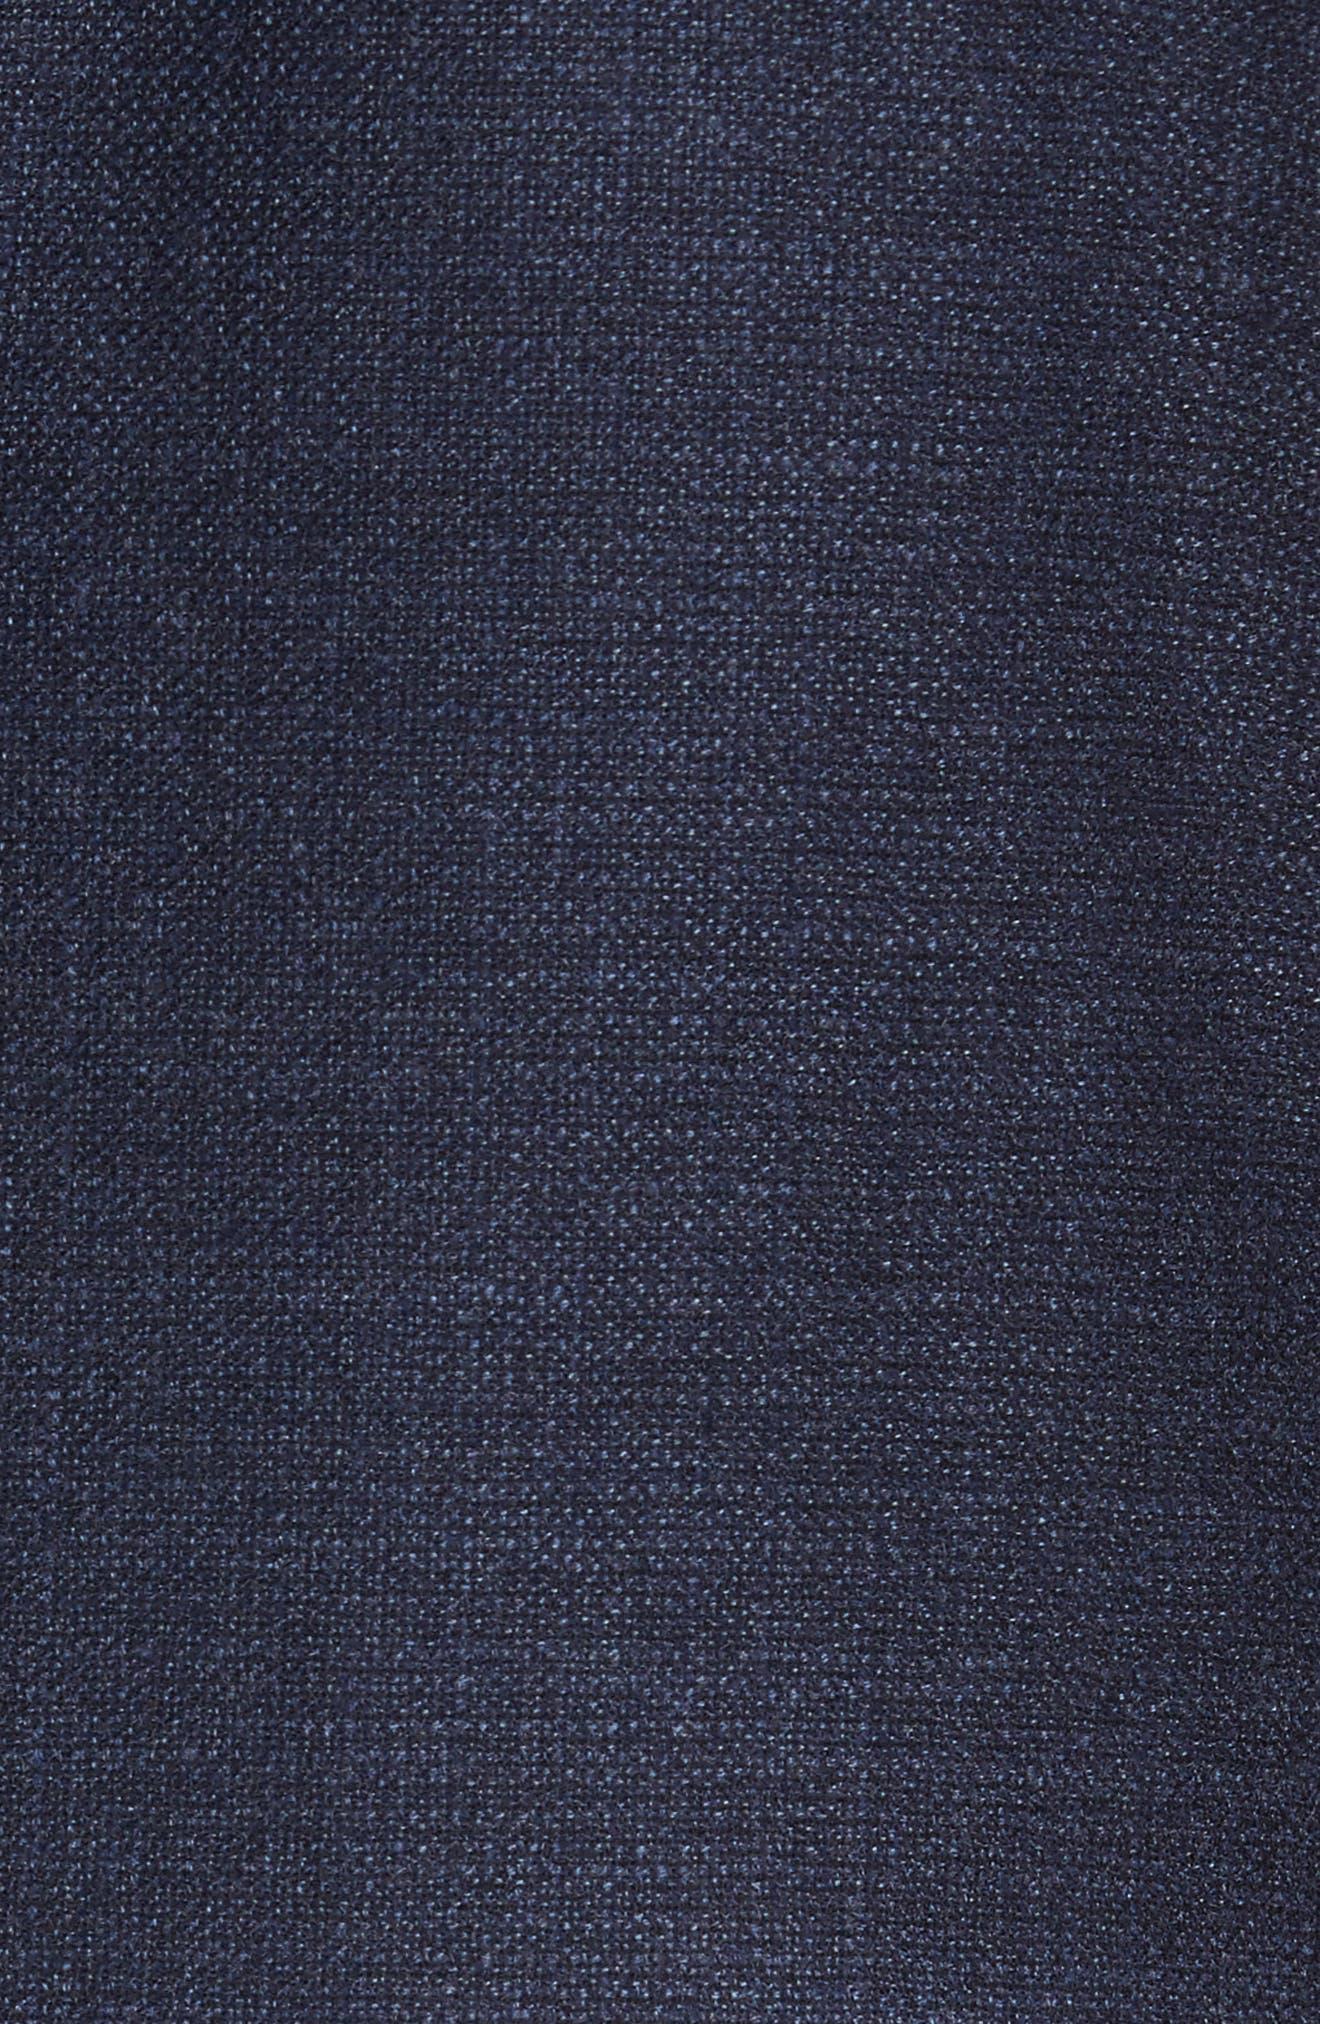 Trim Fit Wool Blazer,                             Alternate thumbnail 6, color,                             400